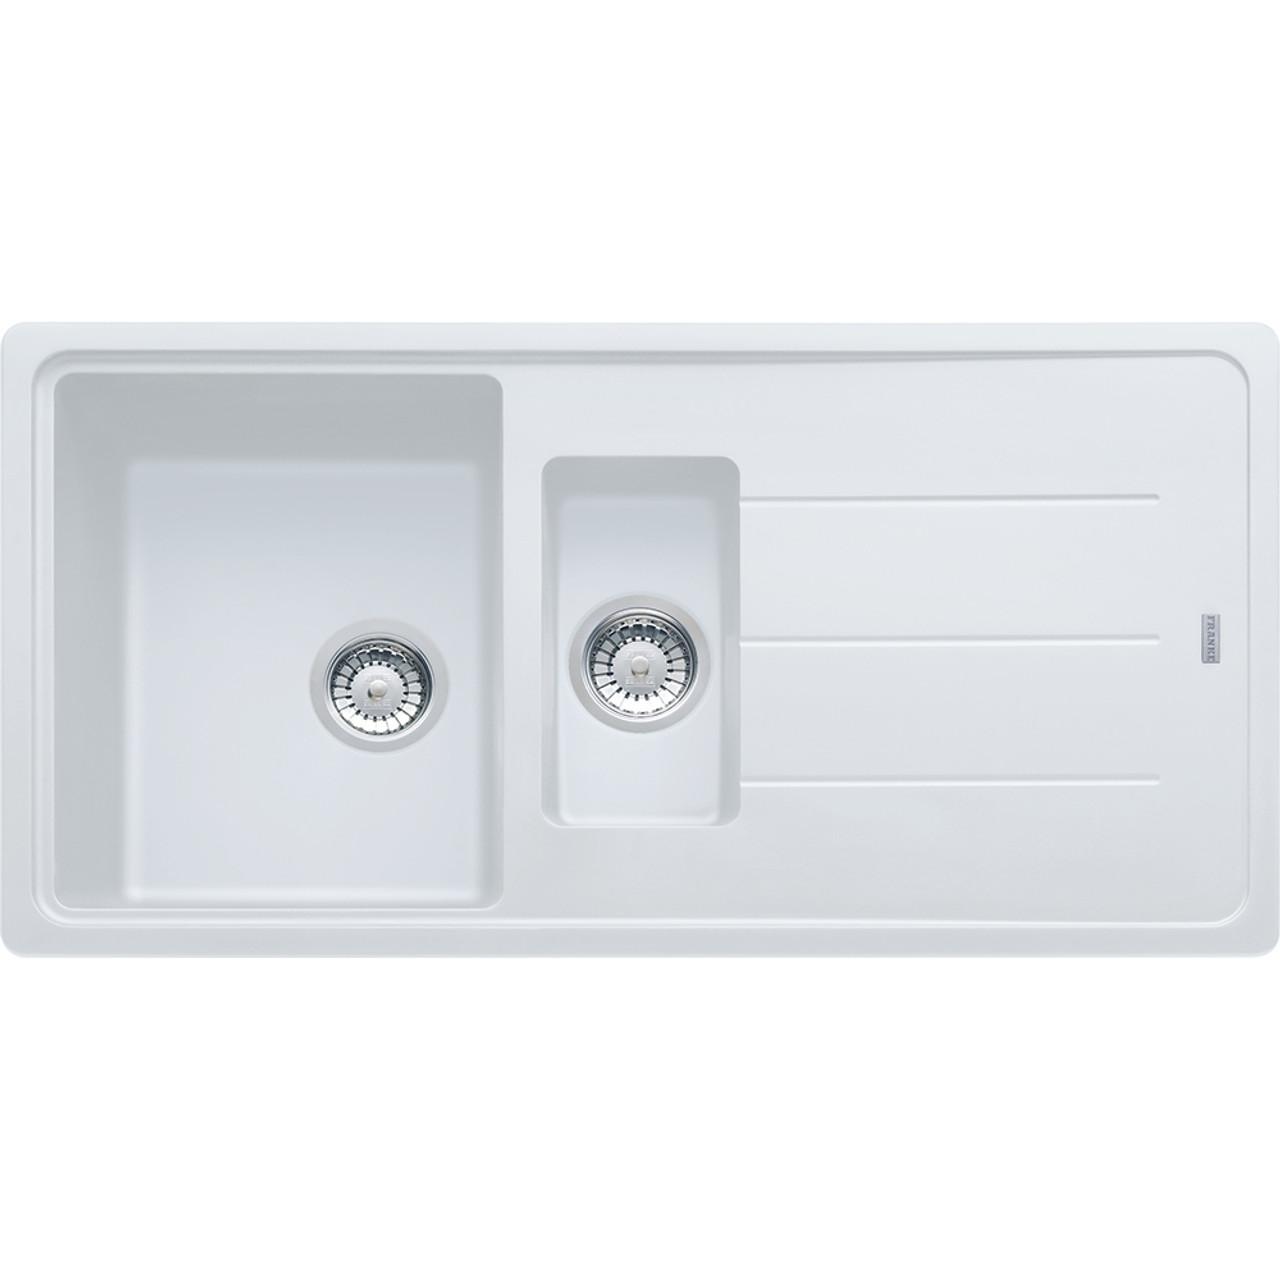 Awesome Franke Basis BFG651 Fragranite Polar White Kitchen Sink ...